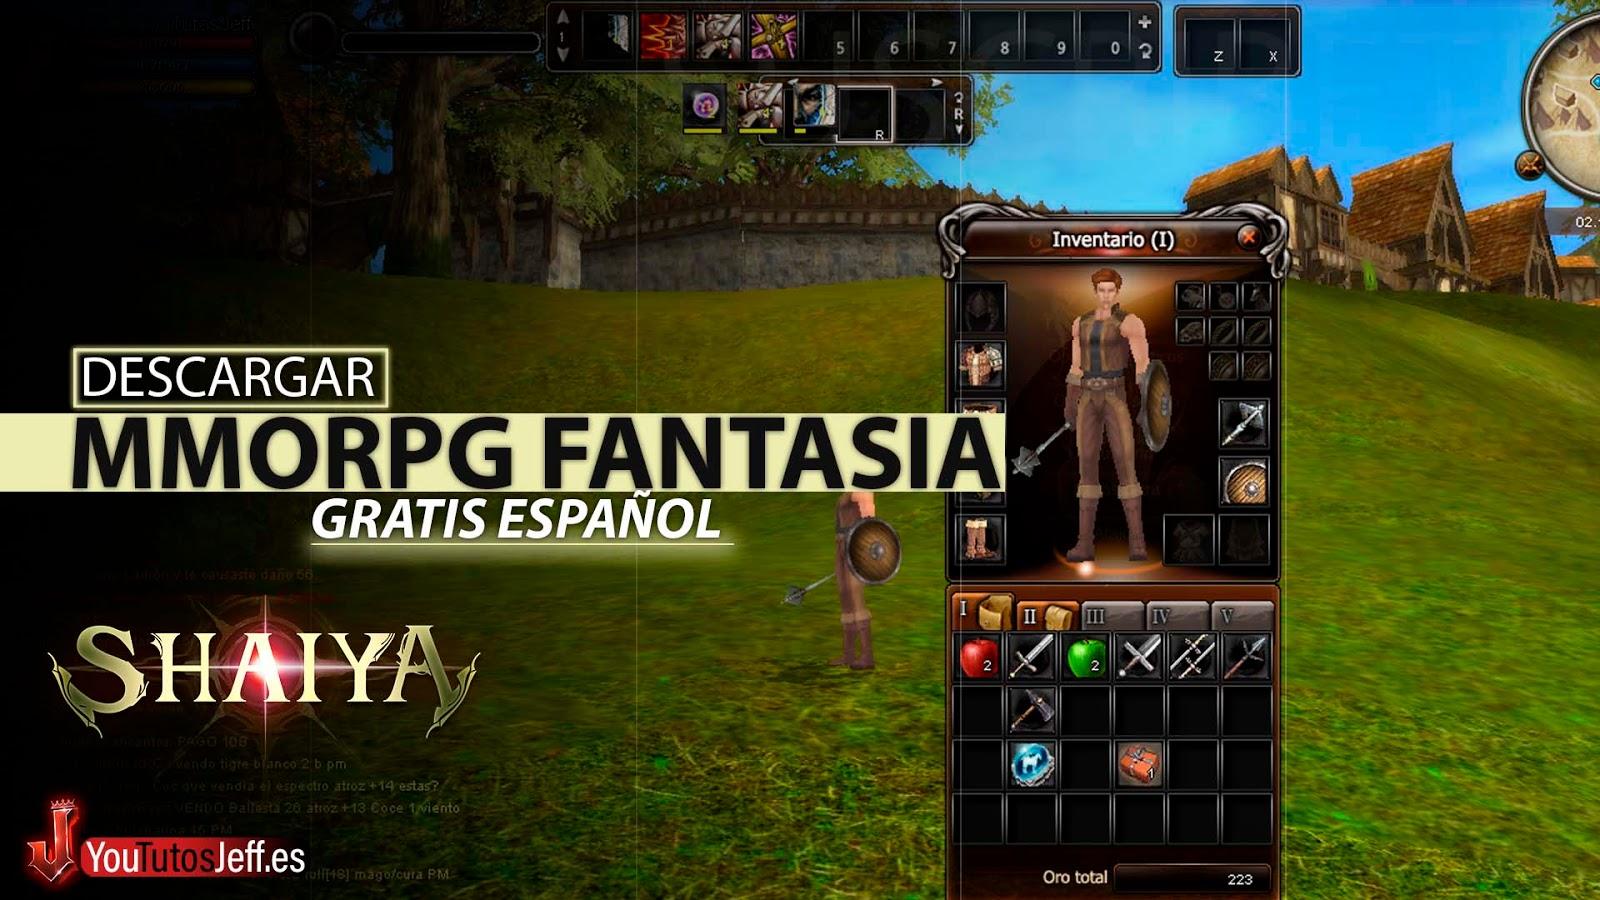 Fantasia MMORGP, Descargar Shaiya Ultima Versión para PC en Español